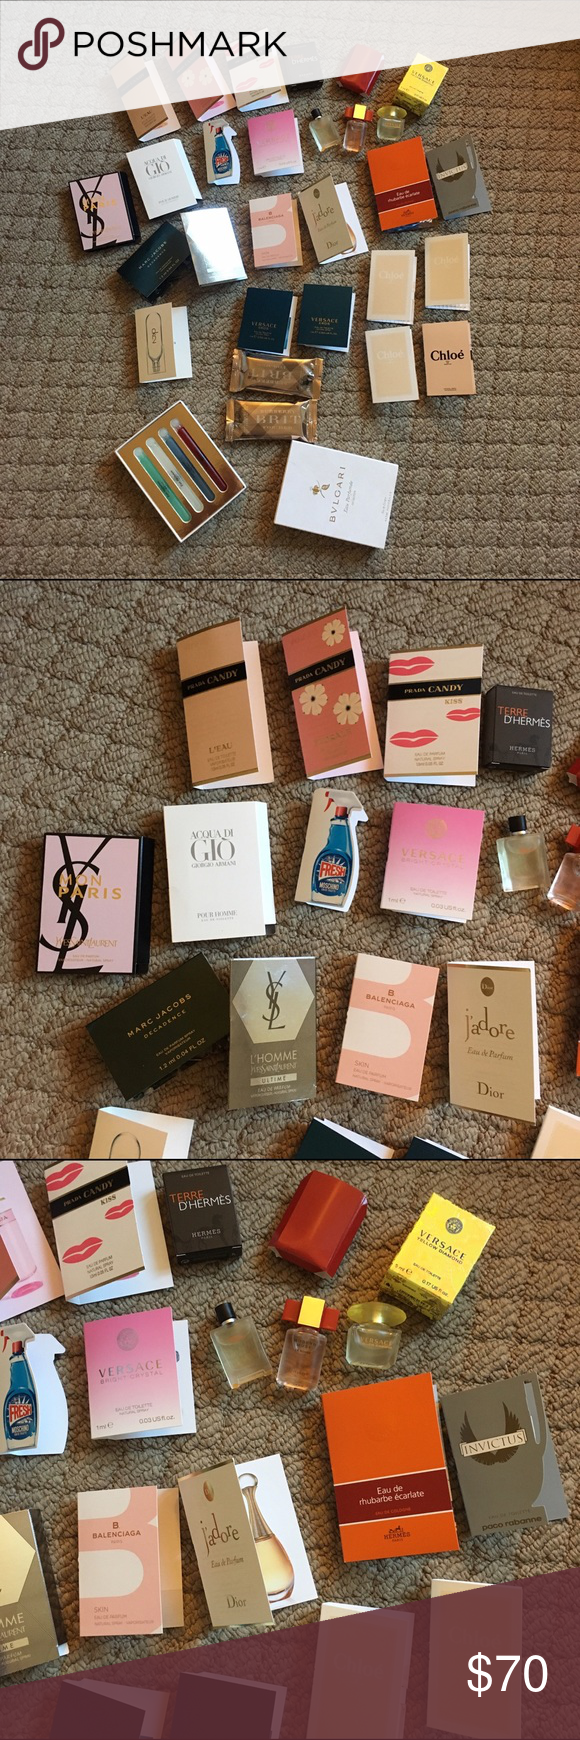 Perfume bundle All new Yves Saint Laurent Makeup